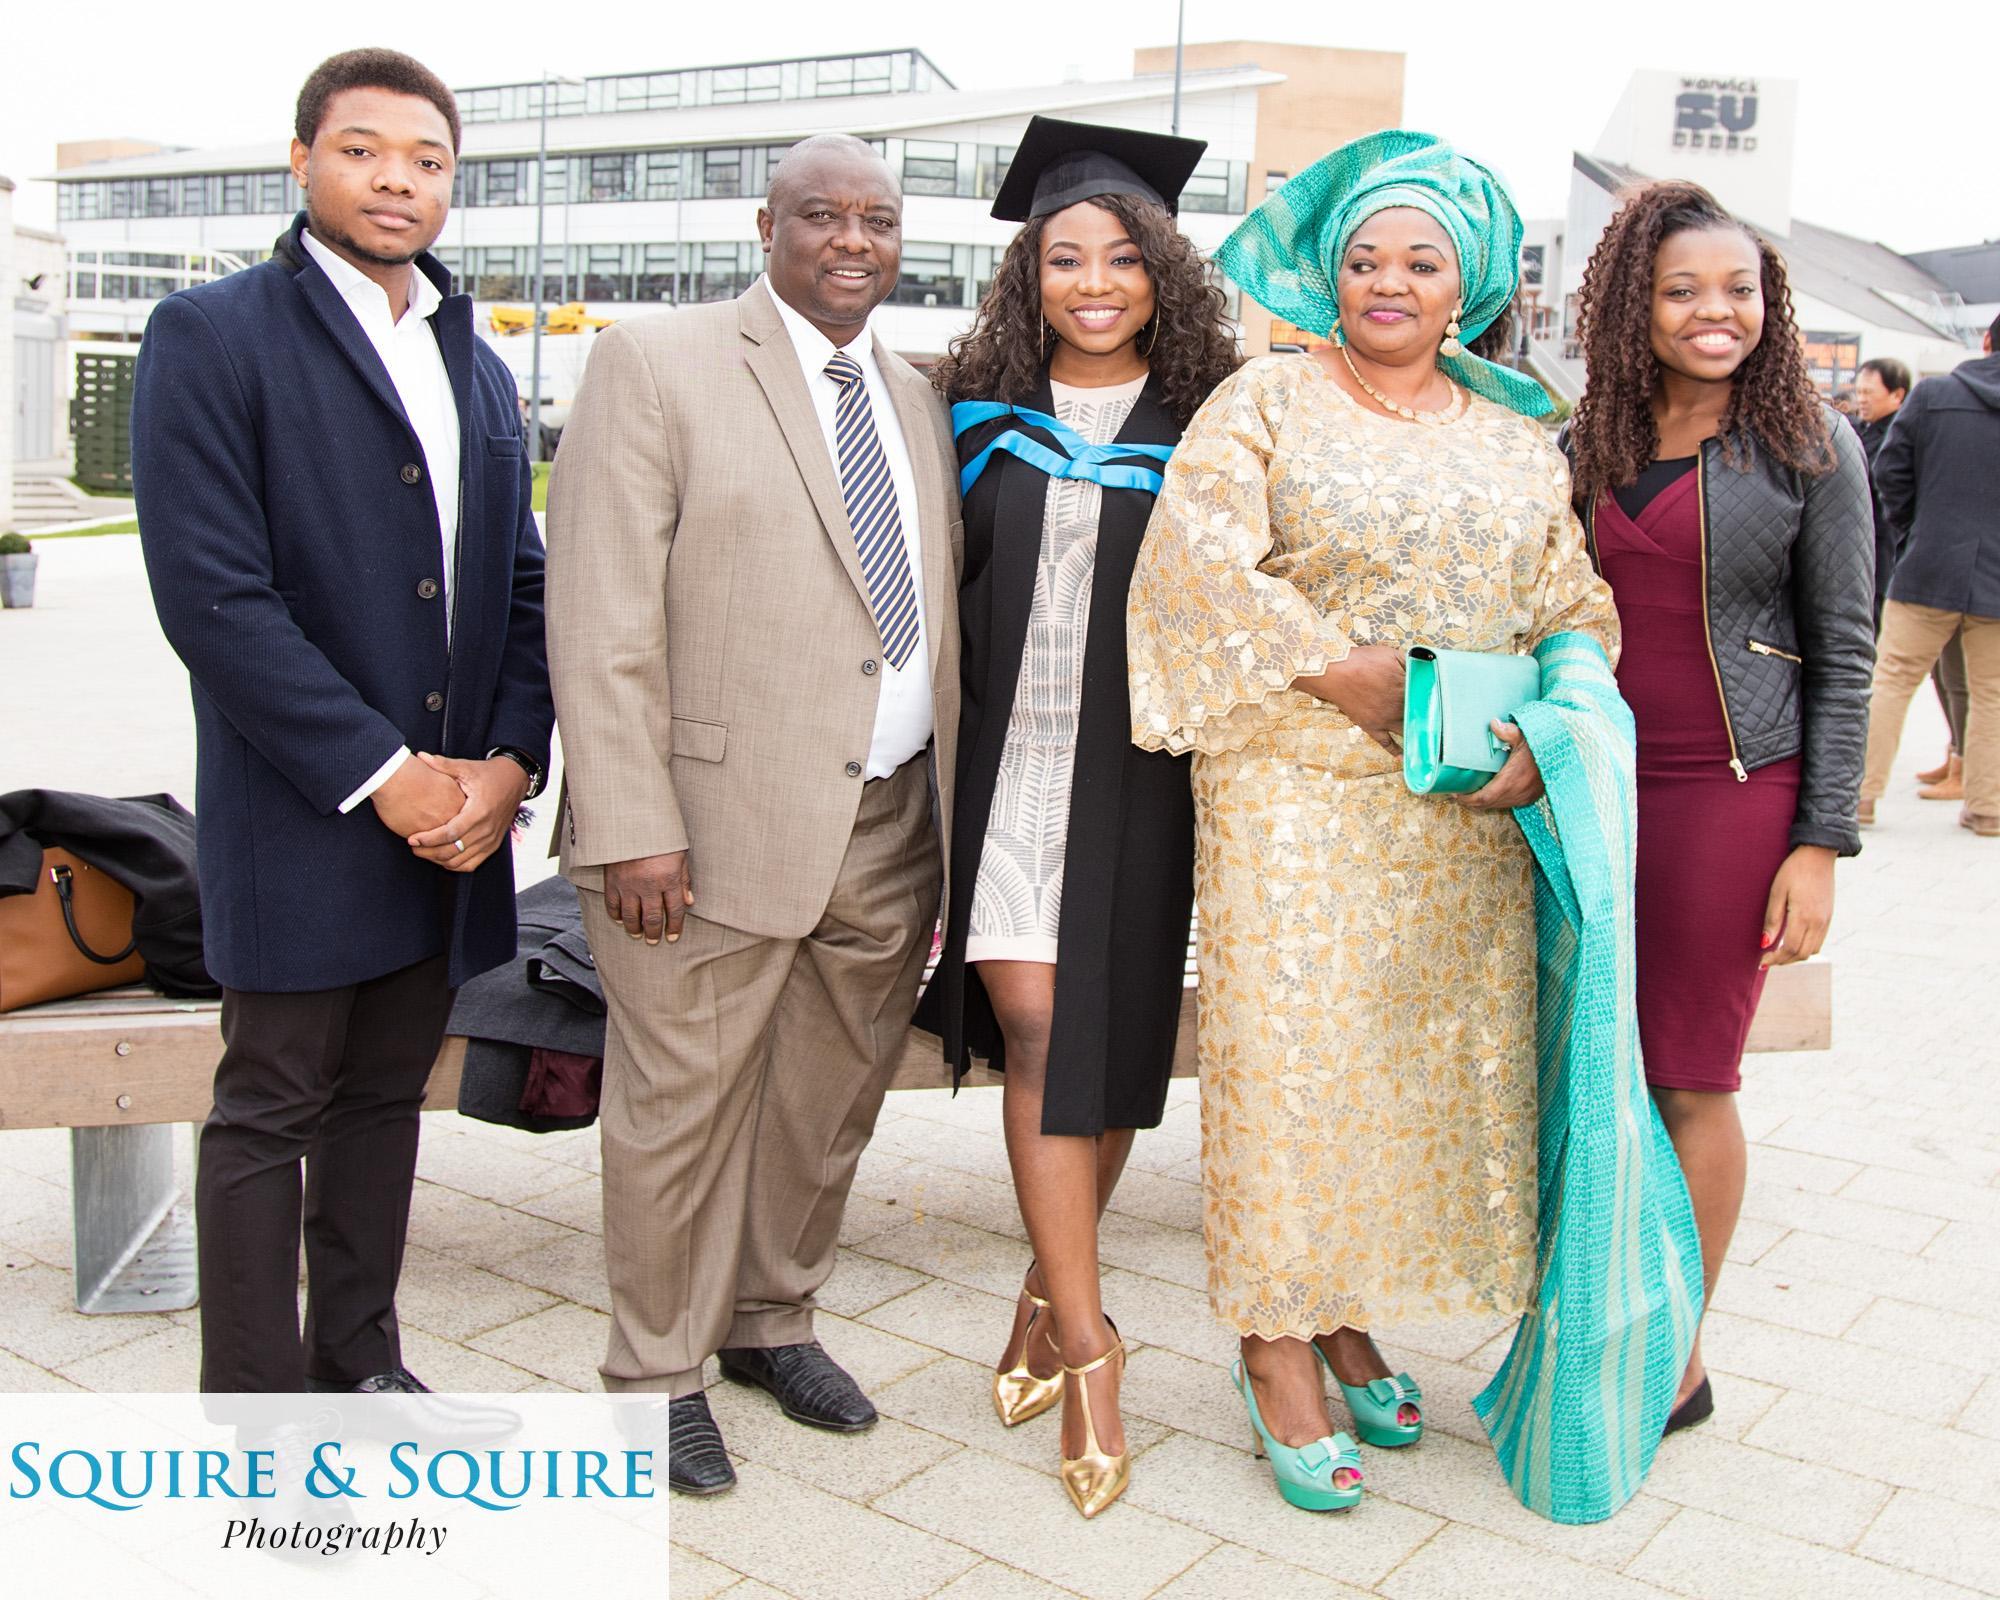 Graduation-Photographer-Warwick-University06.jpg